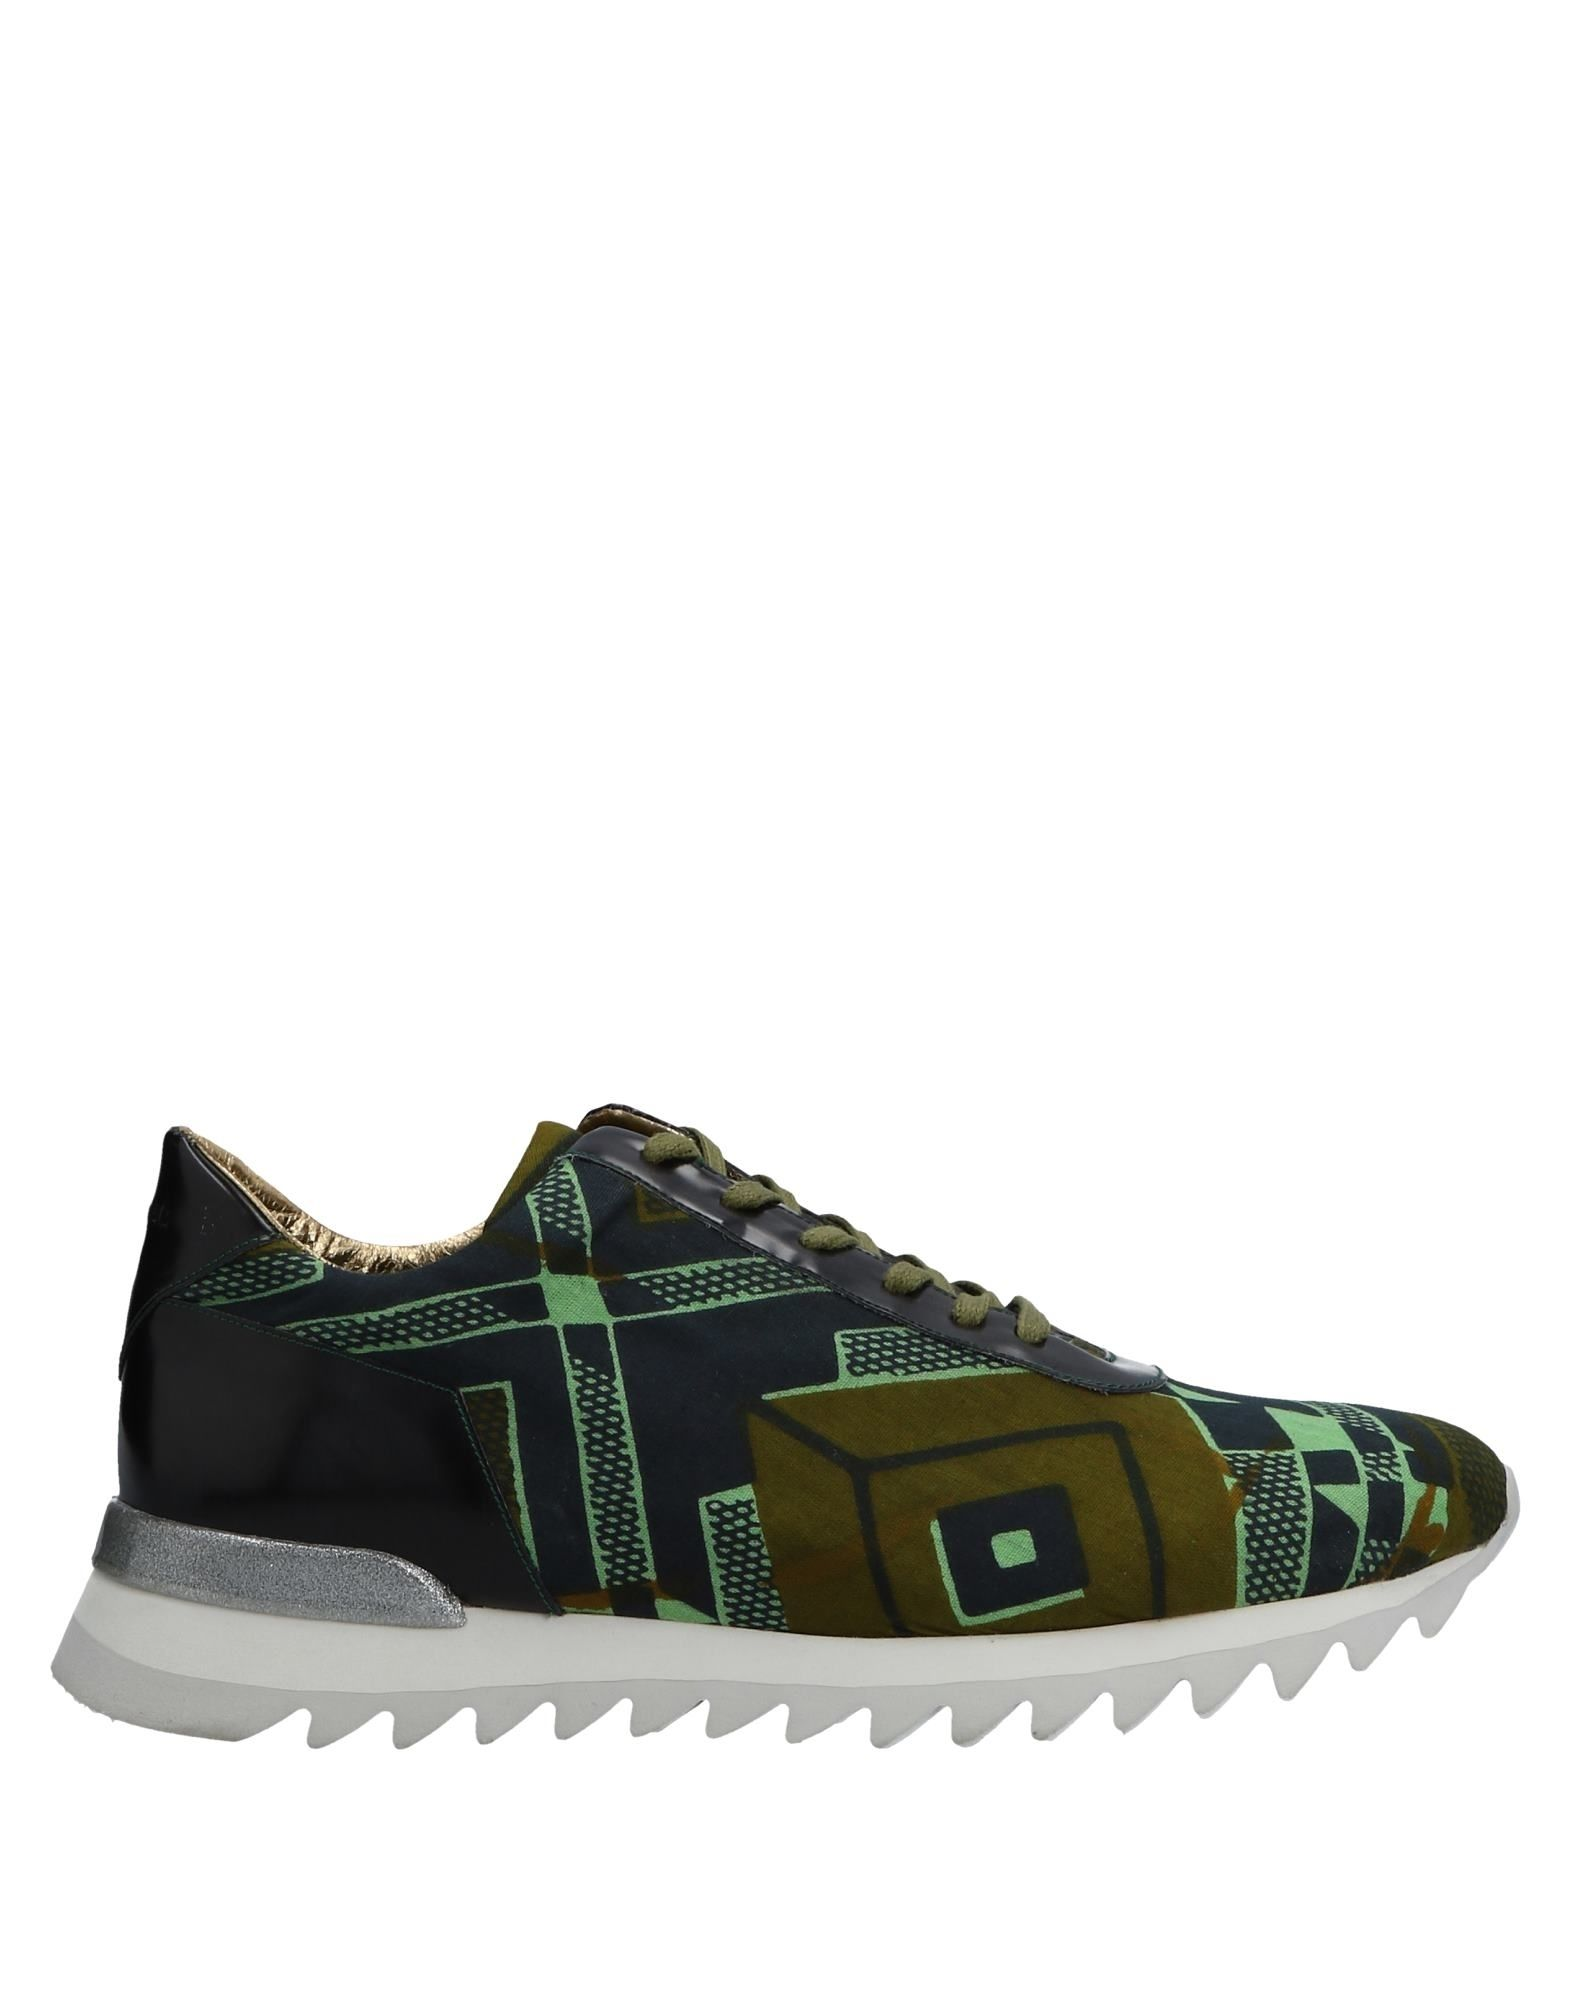 Sneakers Smeet Homme - Sneakers Smeet  Vert militaire Mode pas cher et belle